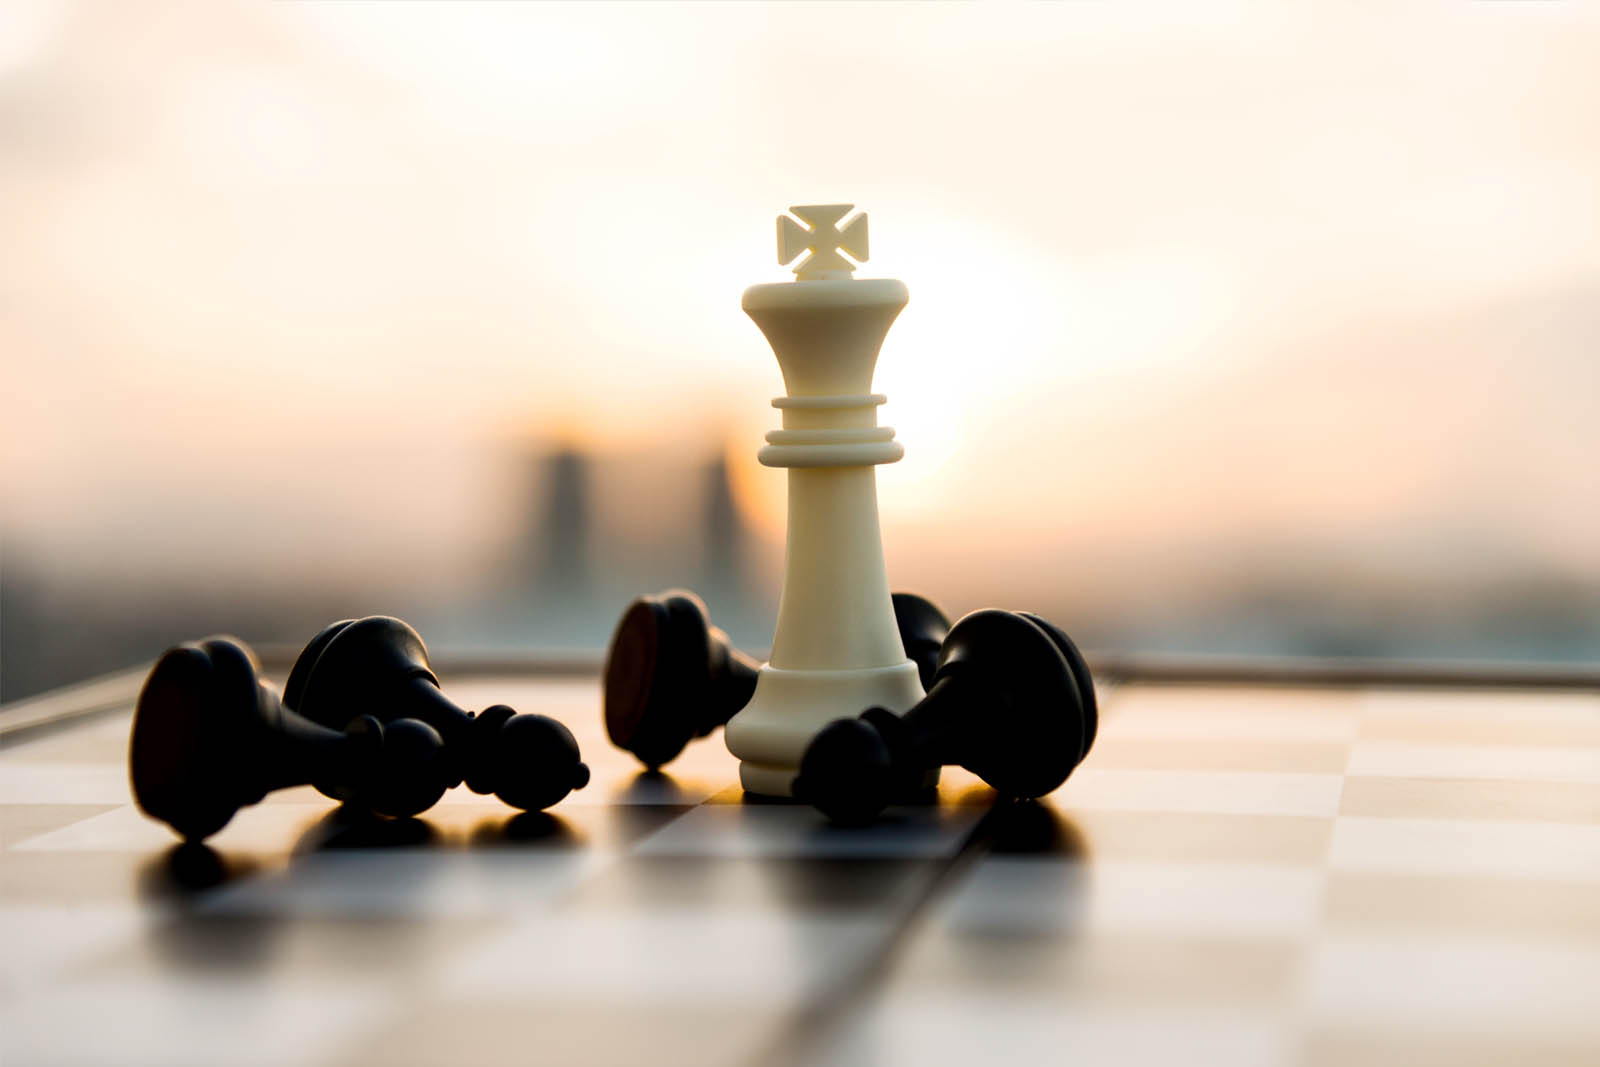 2017-05-16-strategy-tactics.jpg